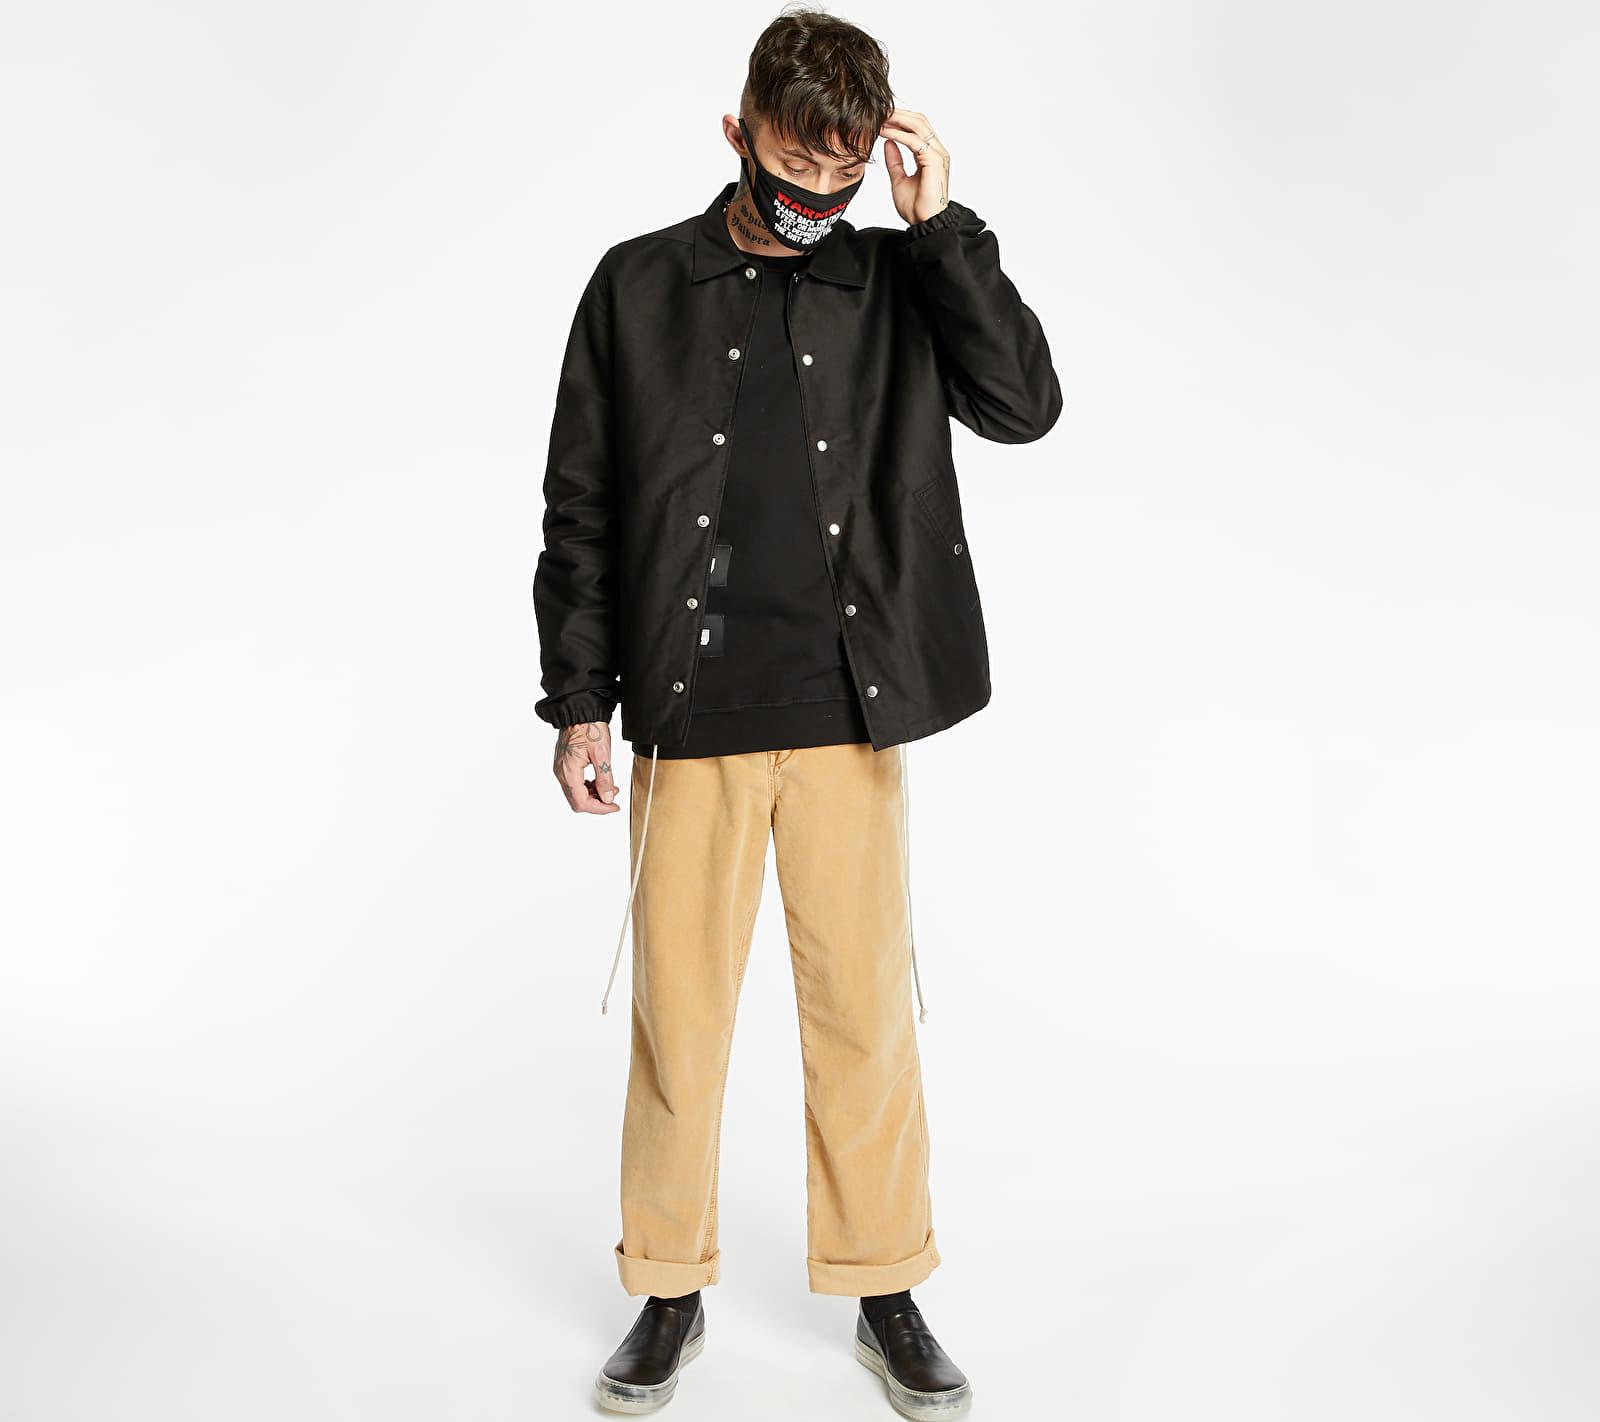 Rick Owens DRKSHDW Snap Front Jacket Black L